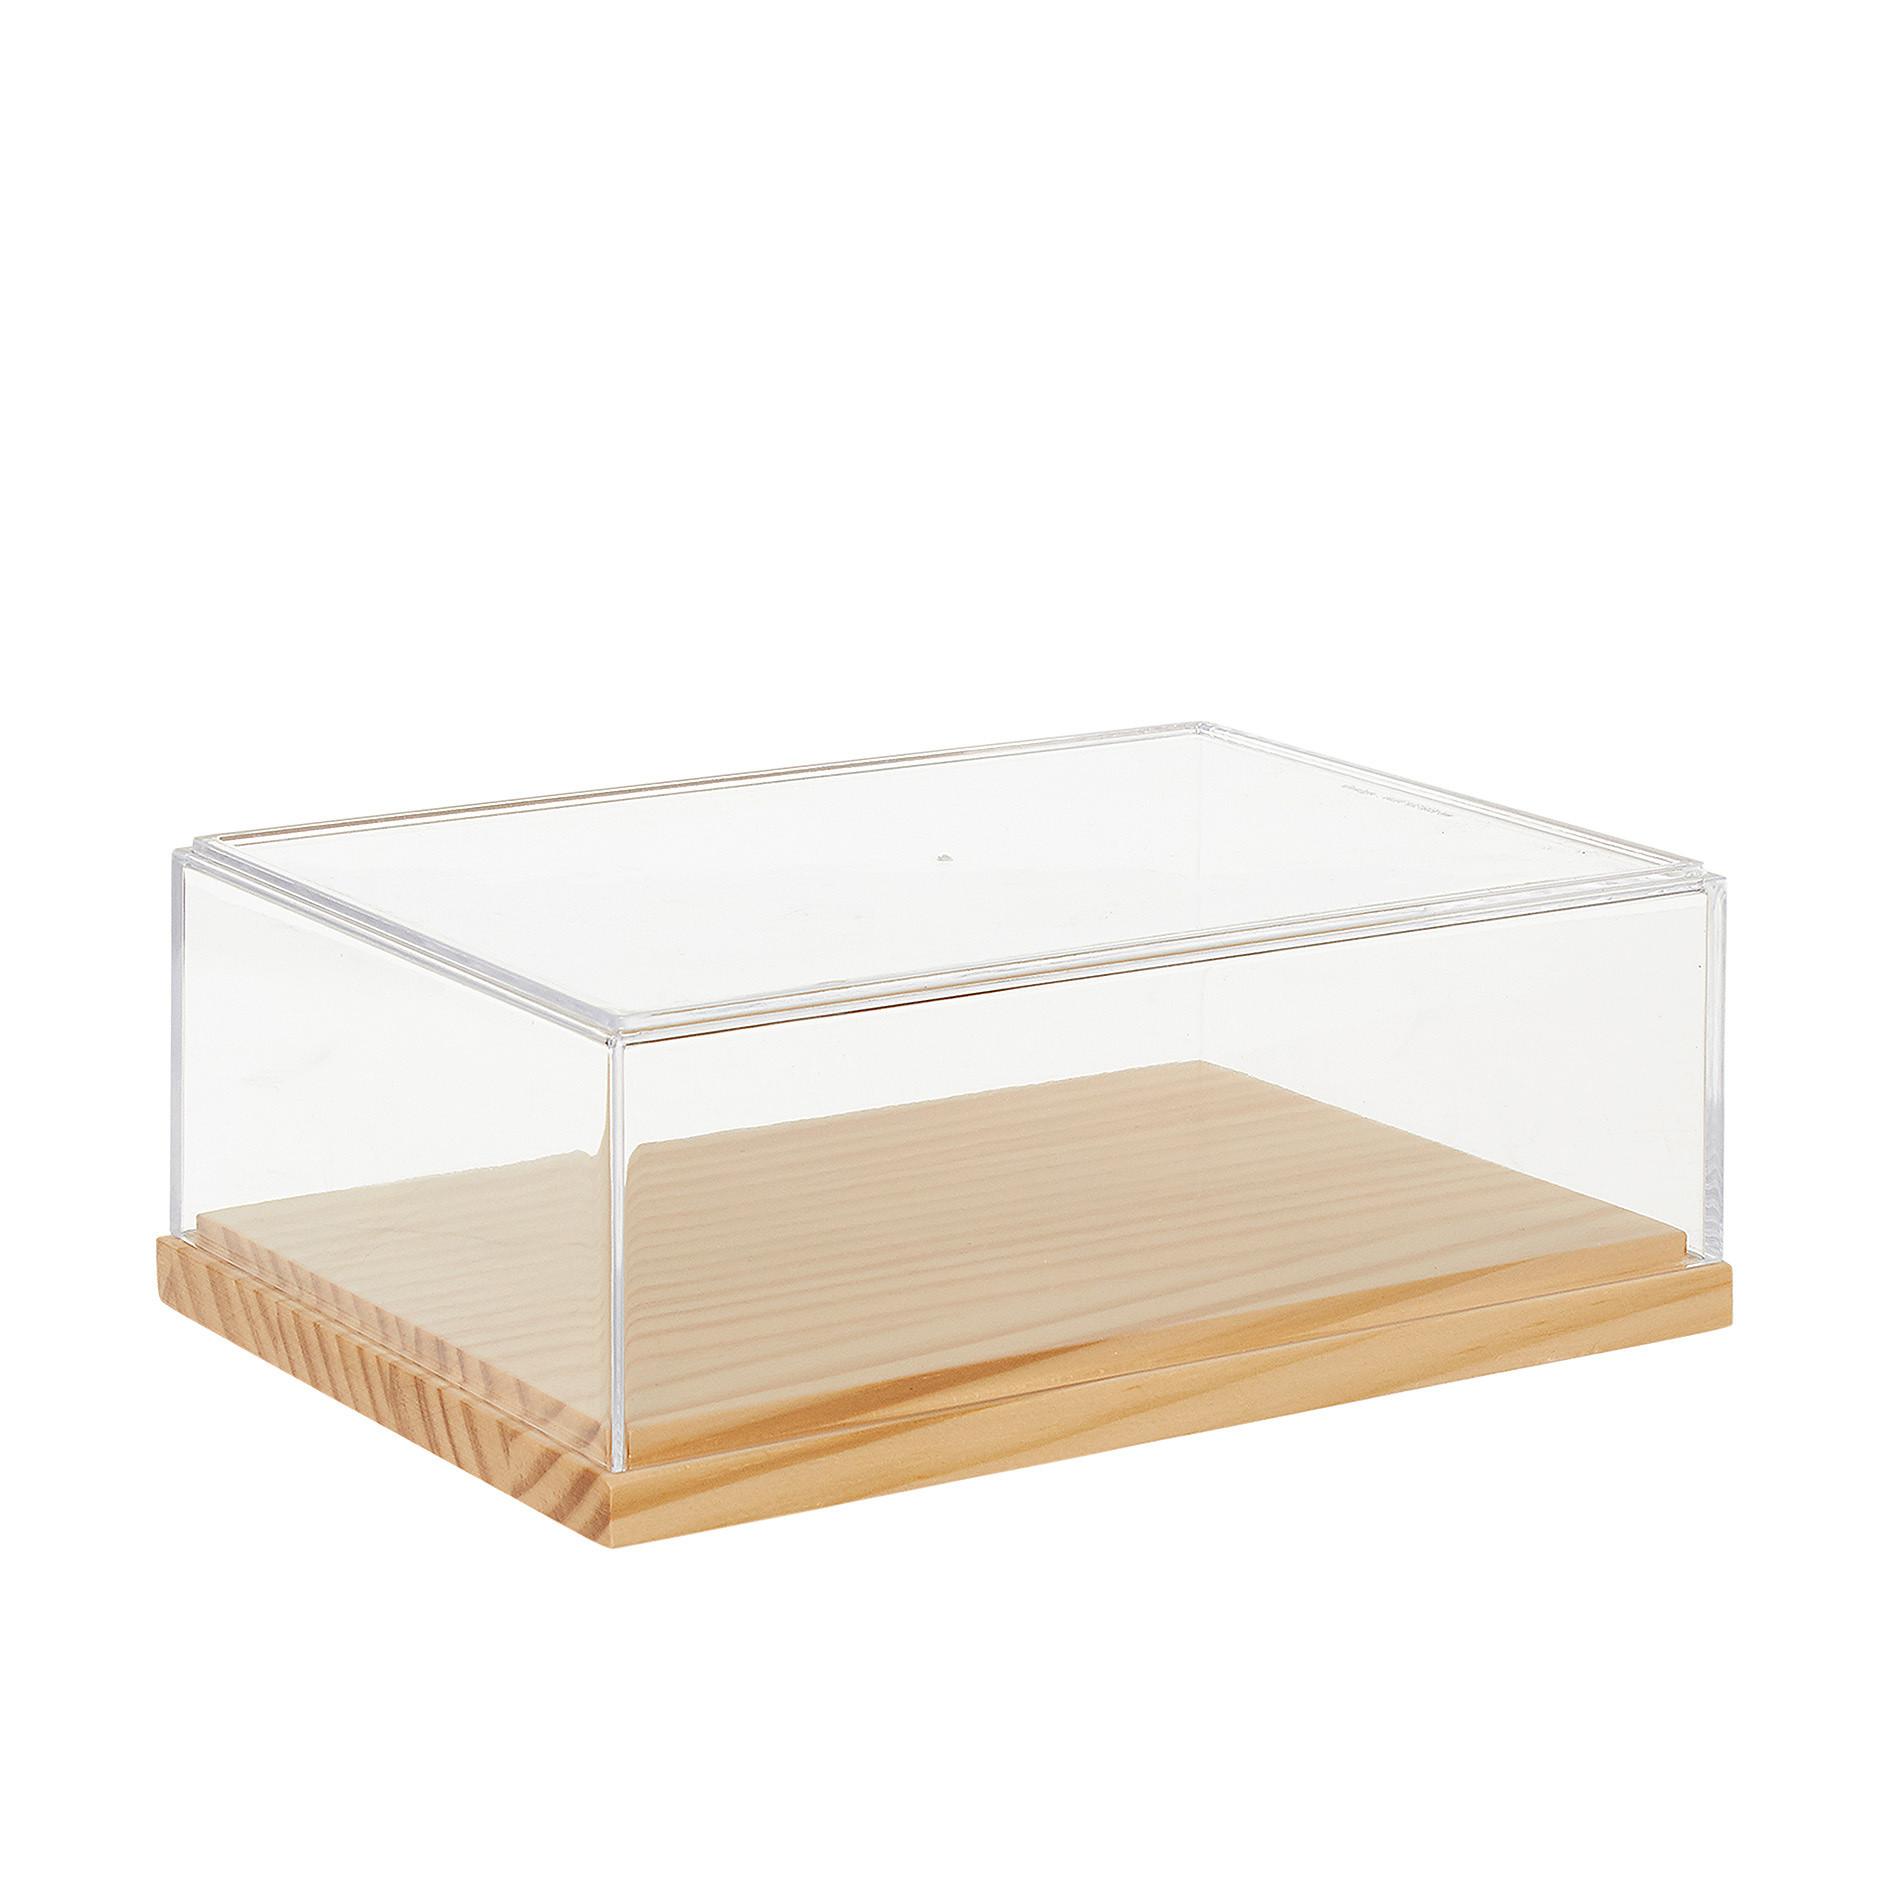 Box in plexiglass e bamboo, Trasparente, large image number 0